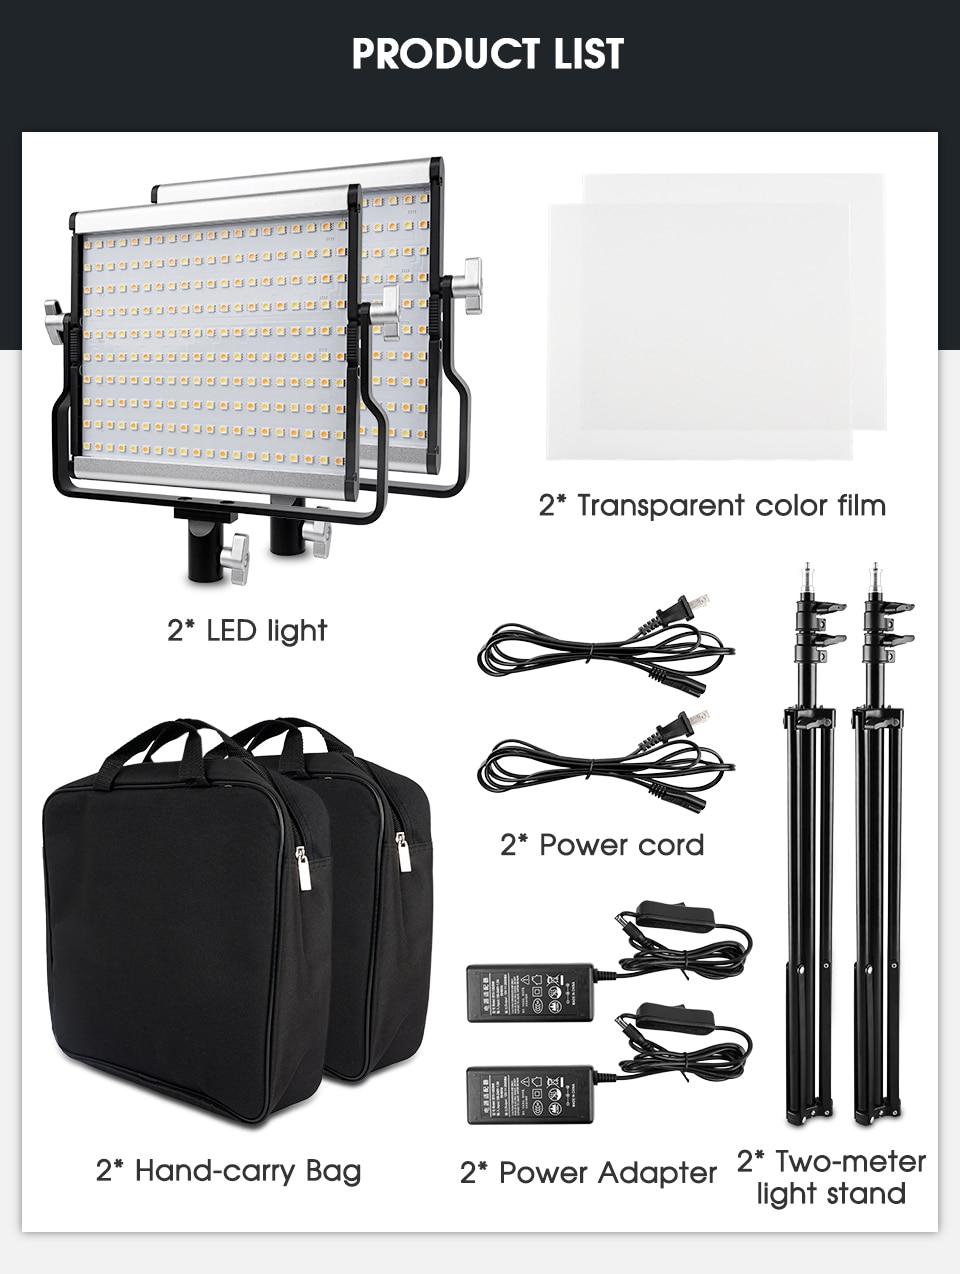 H47471bb20bc745d6b39bd4fd91d182ffS Travor Dimmable Bi-color 2set LED Video Light Kit with U Bracket 3200K-5600K CRI96 and Bag for Studio Photography Video Shooting